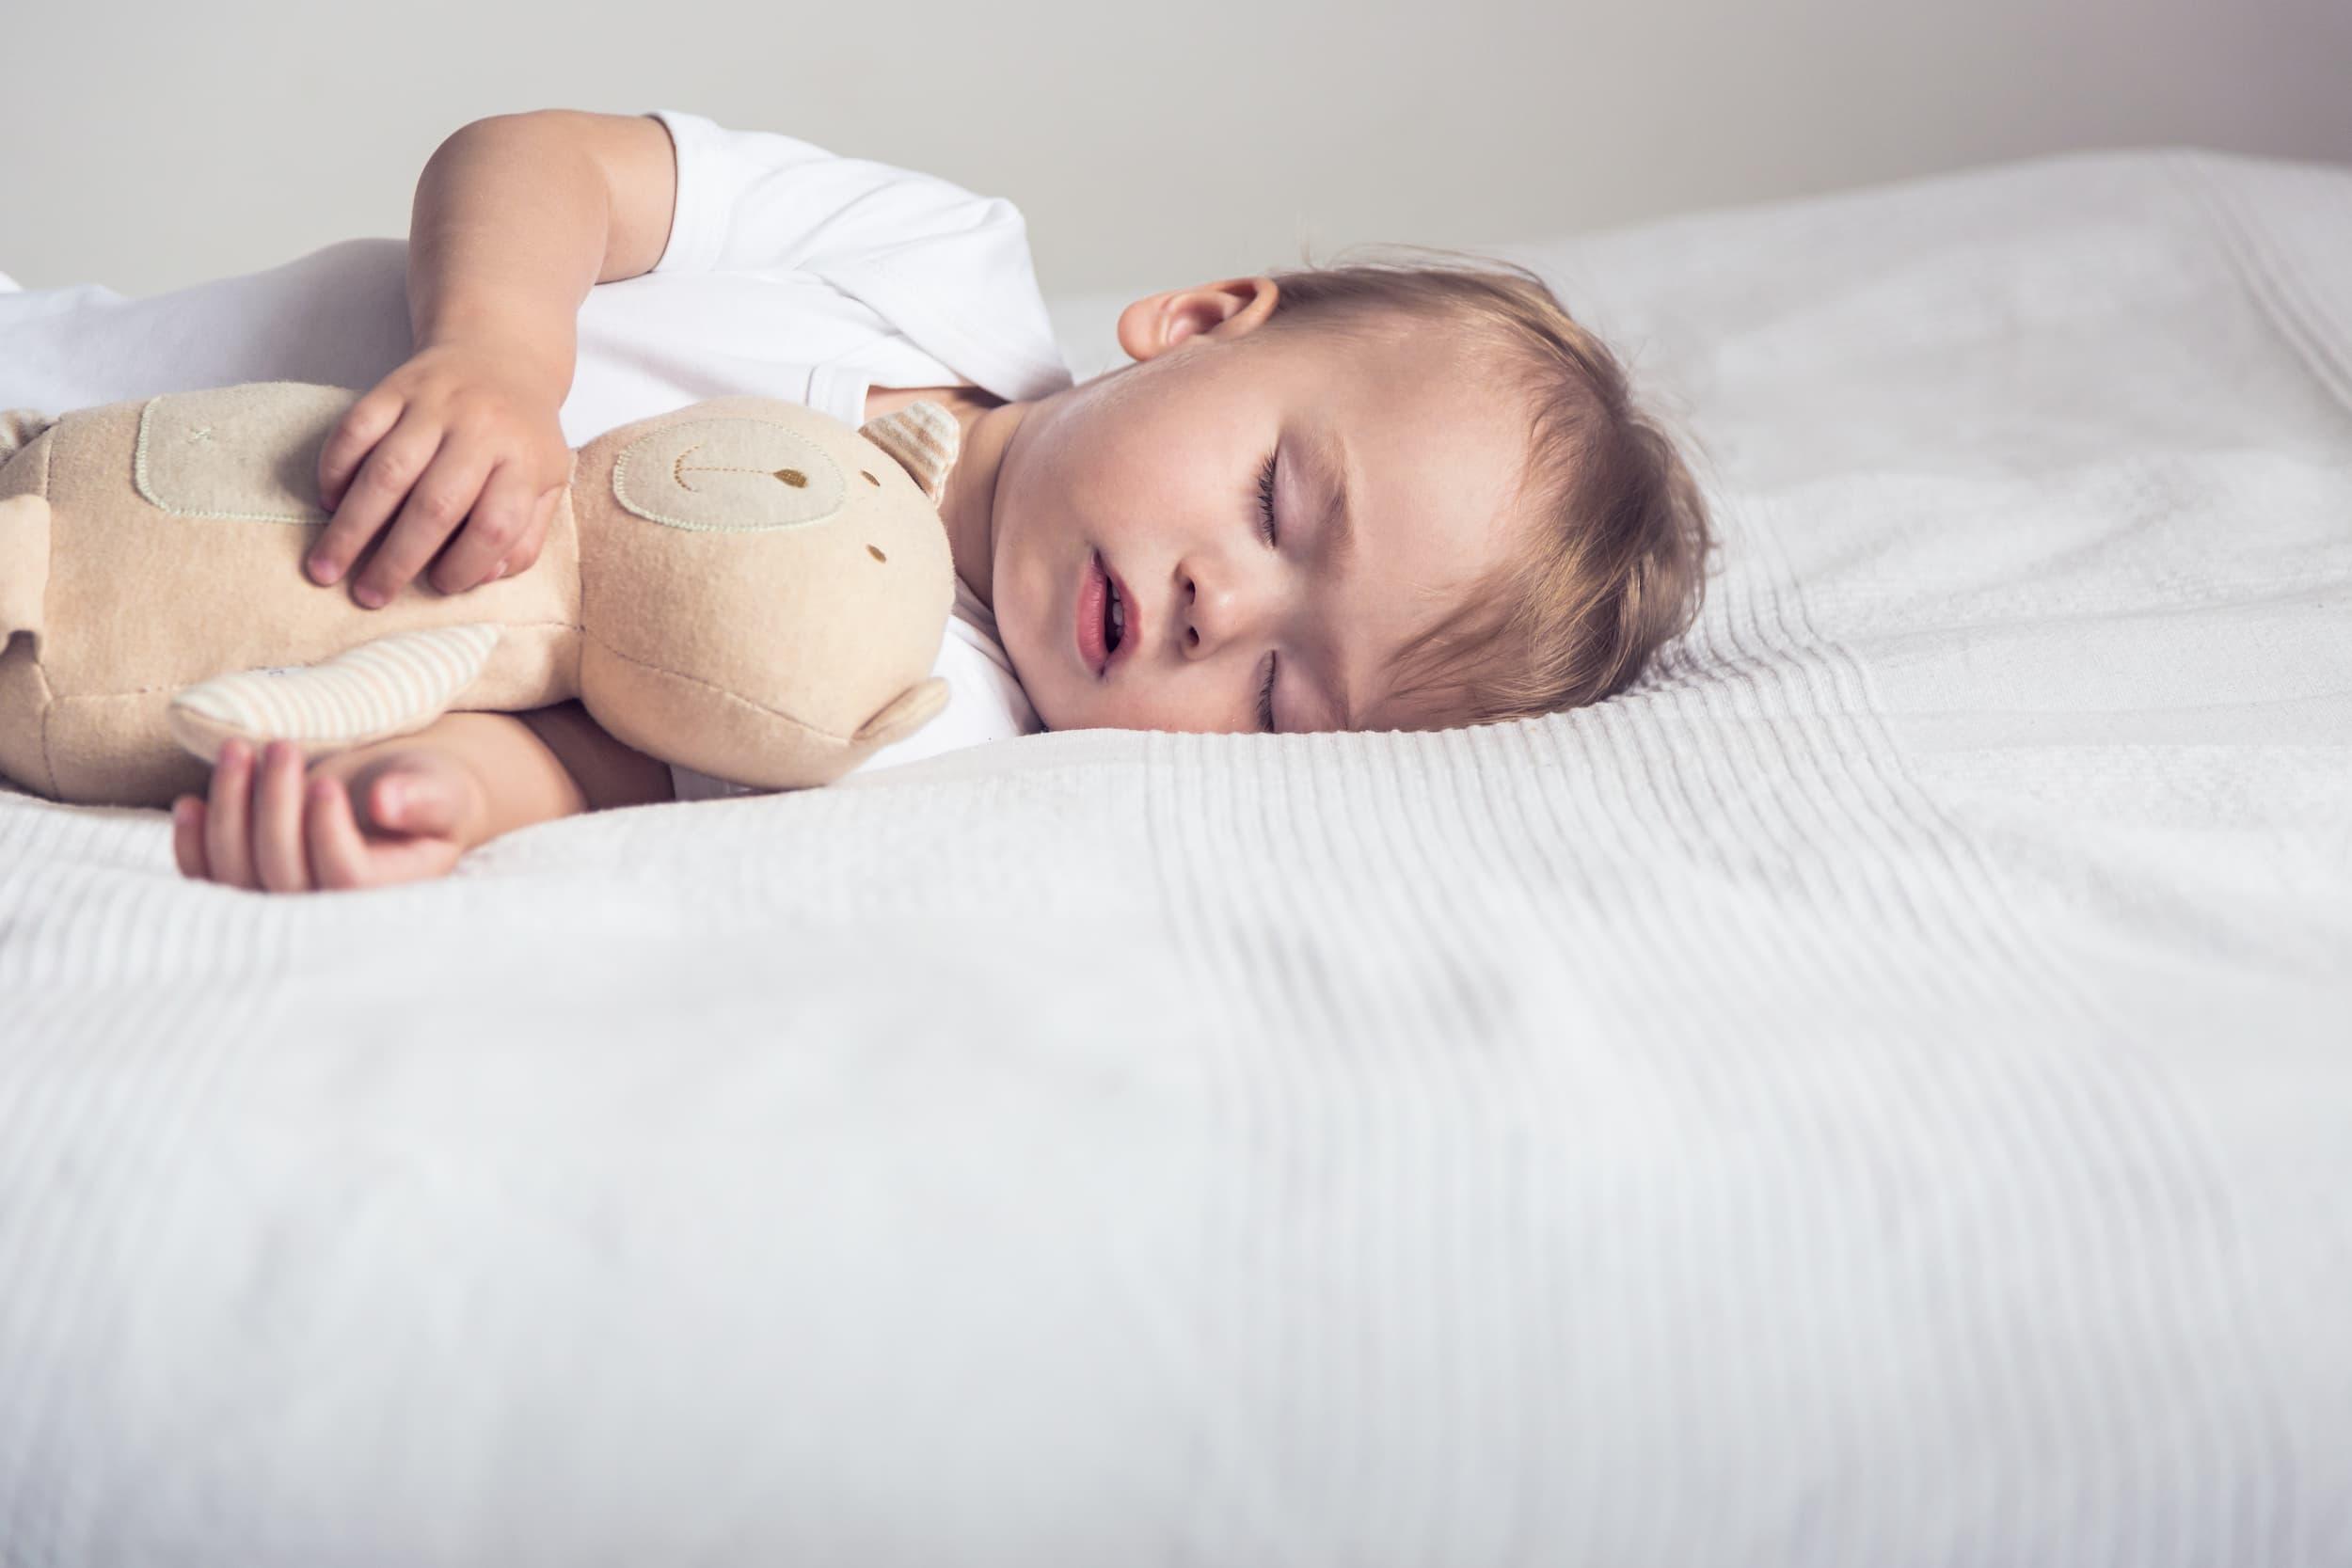 Baby boy sleeping on a bed with teddy bear